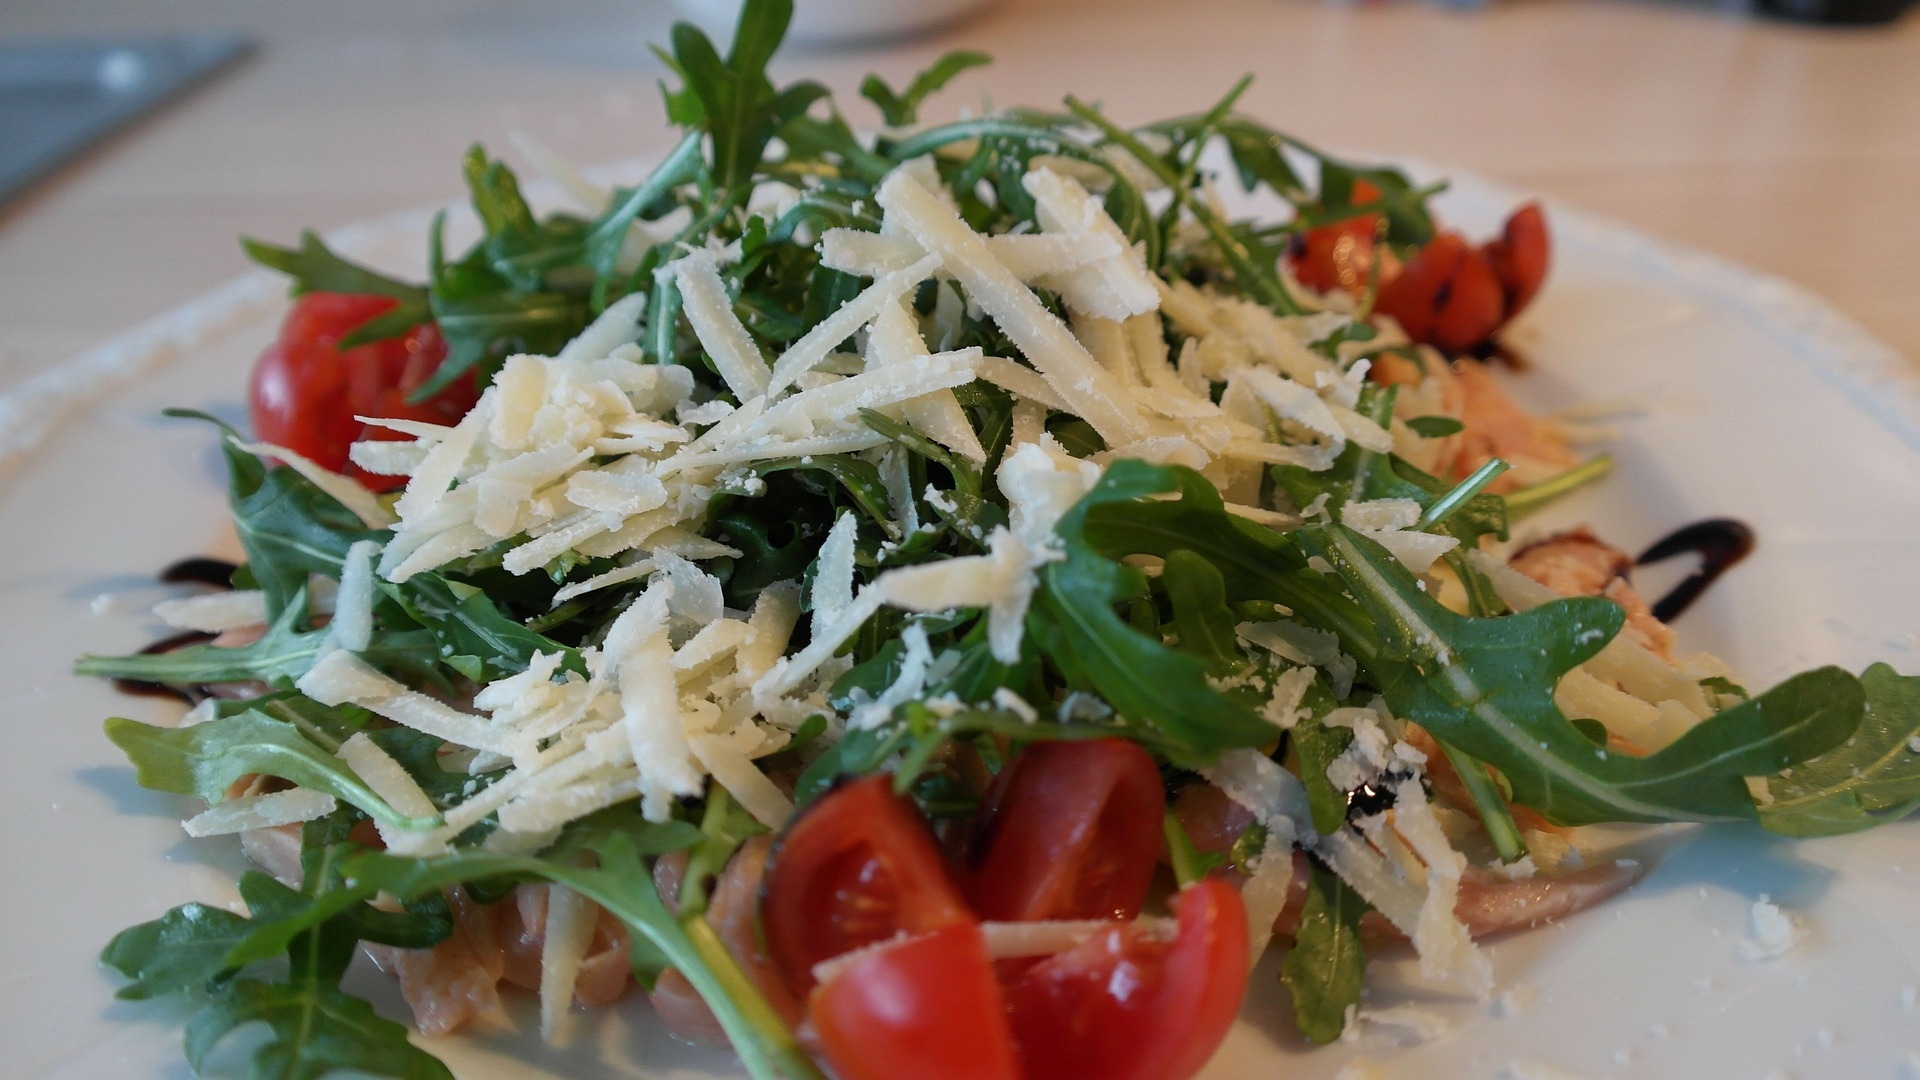 Roculasalat mit Käse und Tomaten